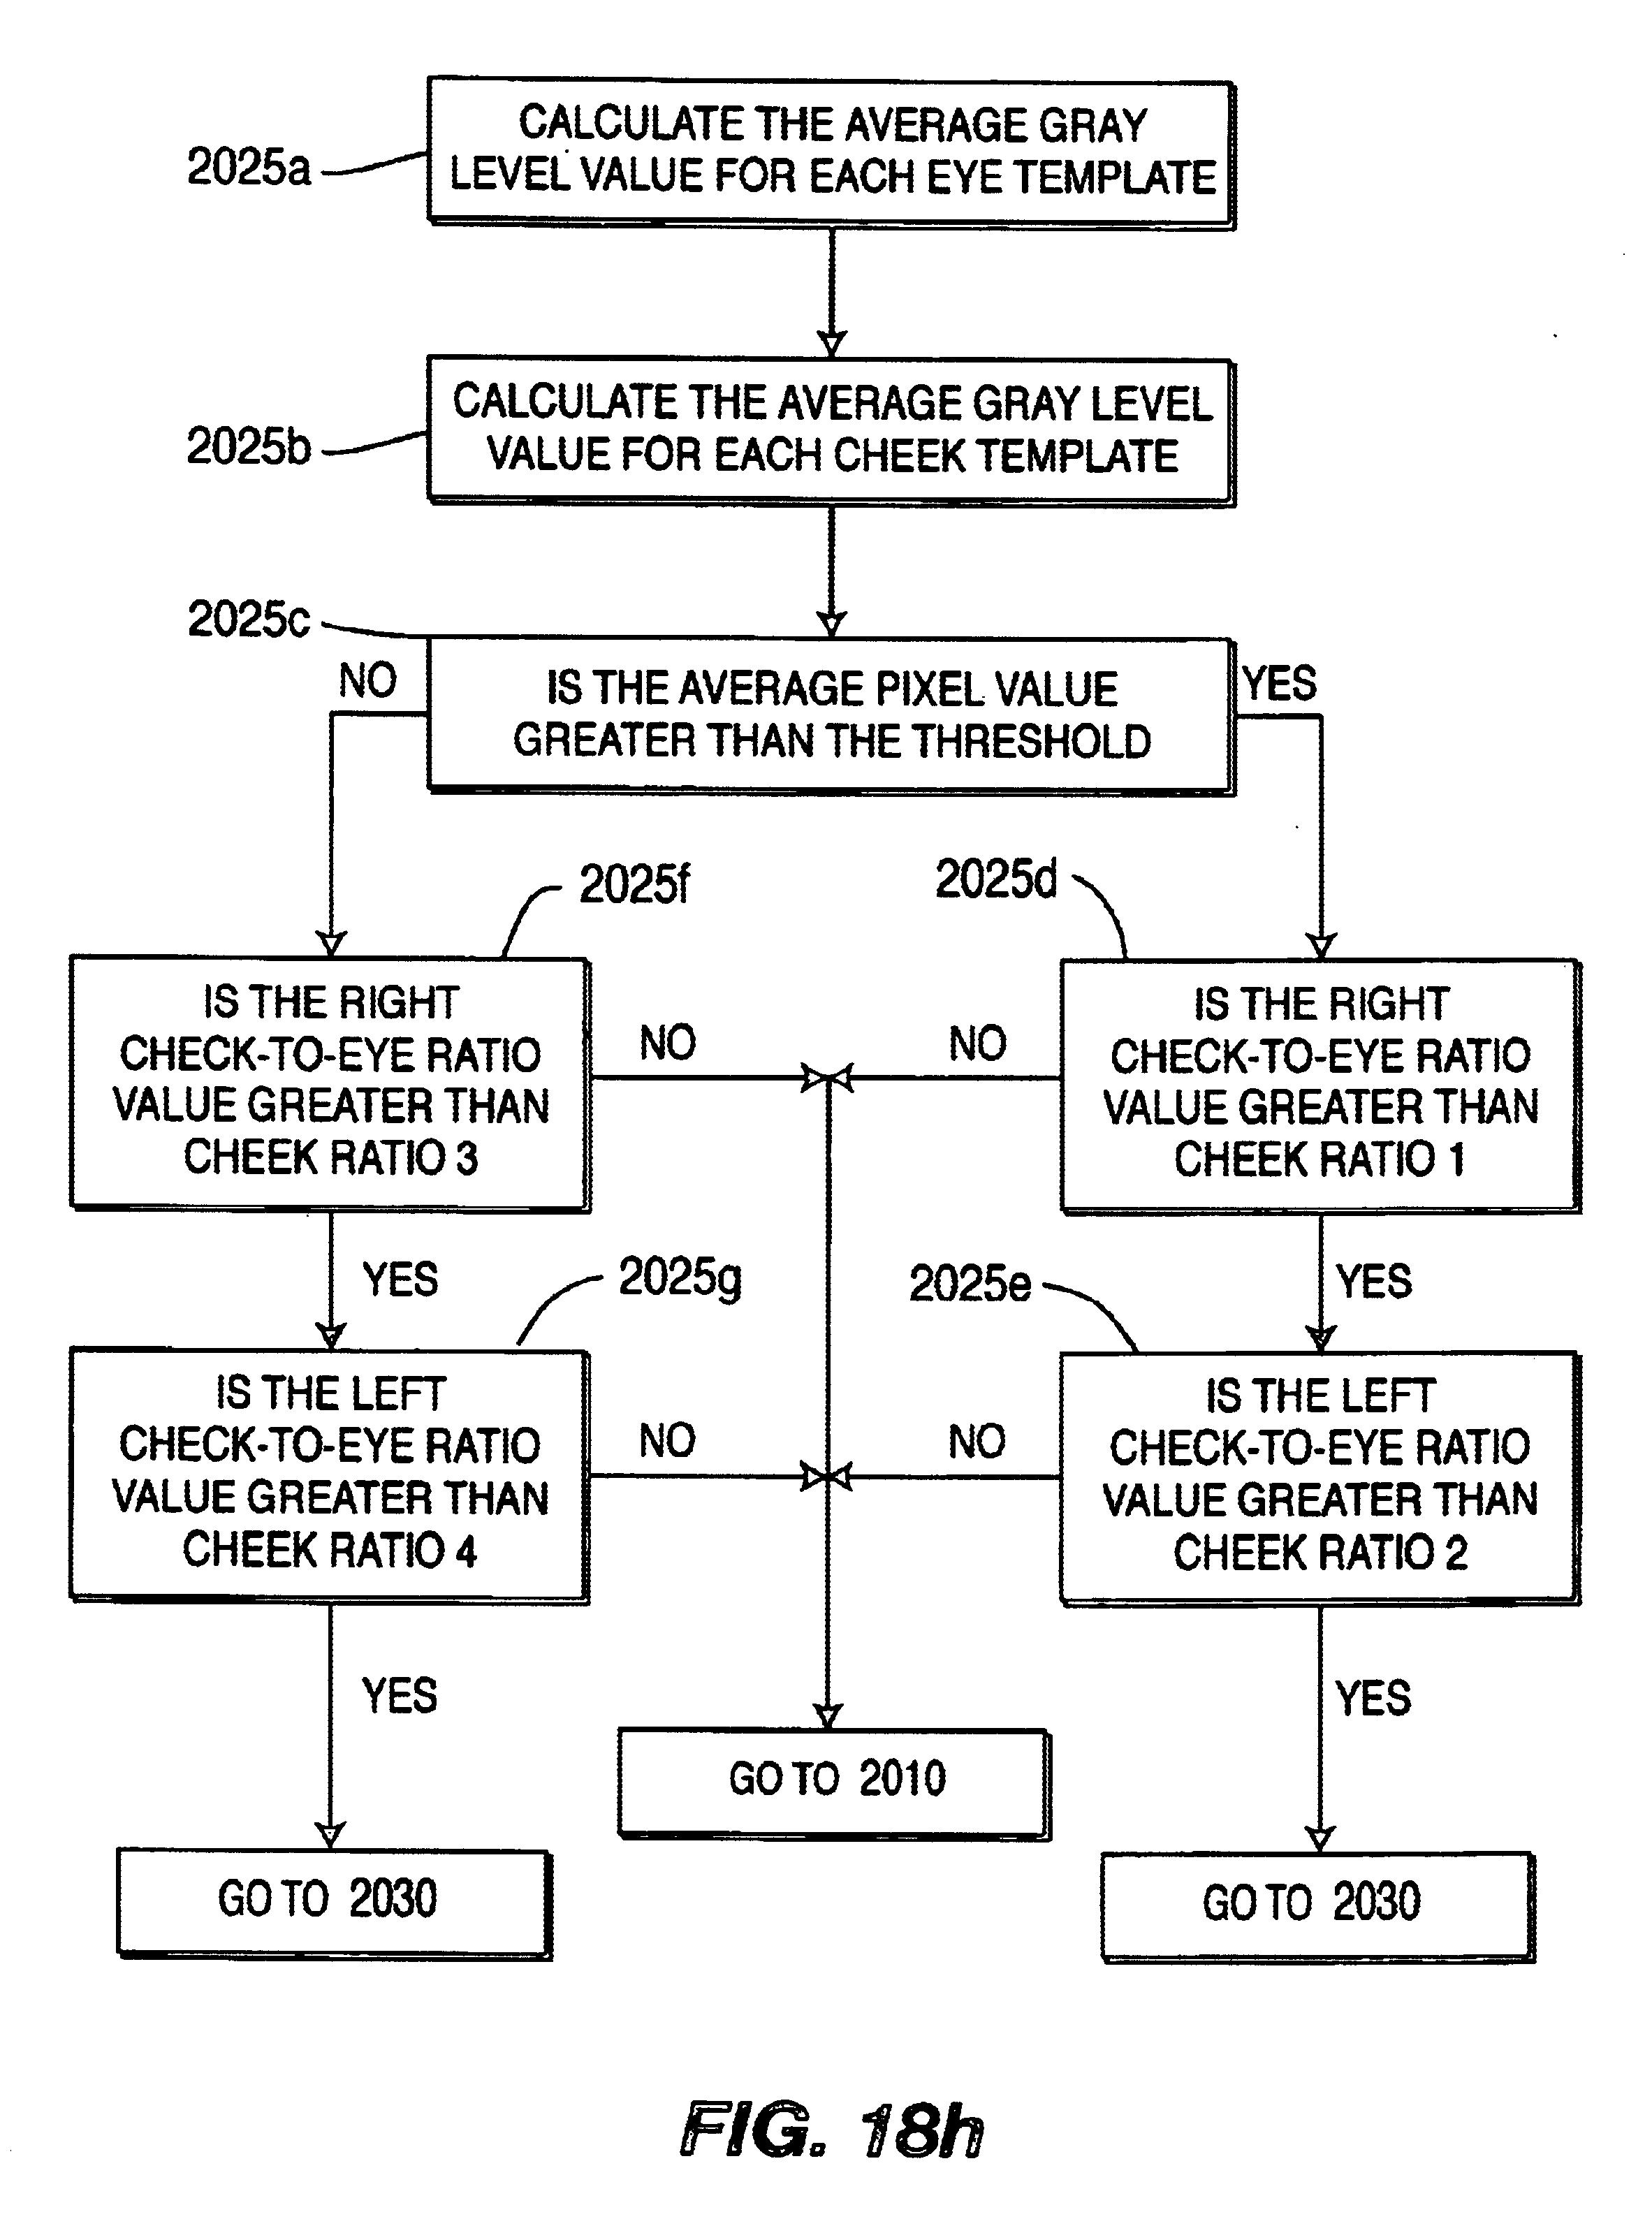 Patent US 6 714 665 B1